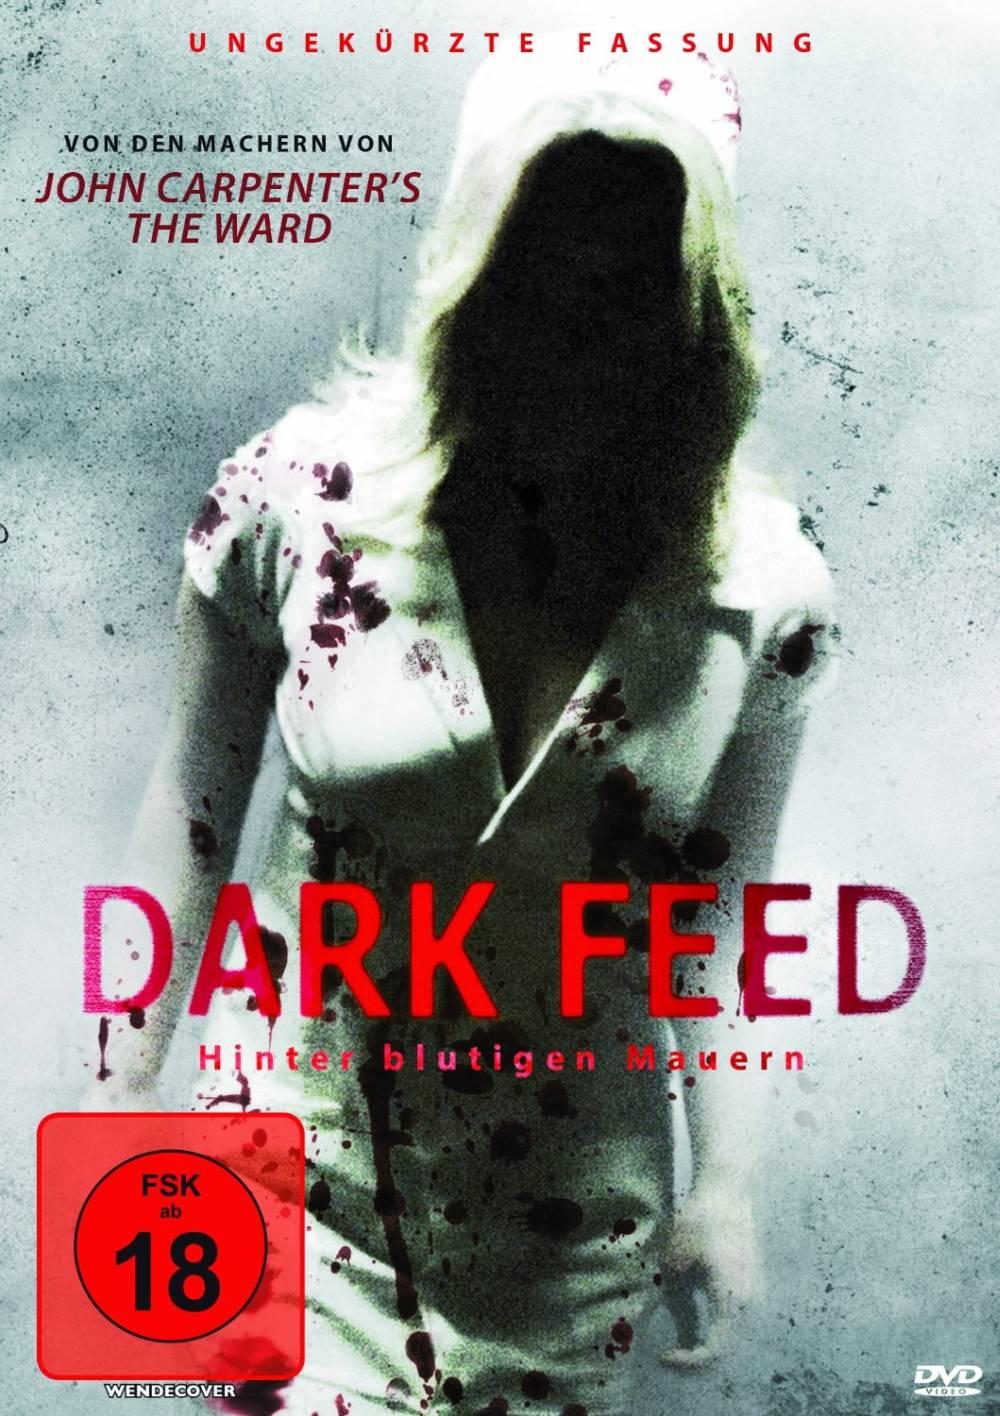 dark feed hinter blutigen mauern film 2011 scary. Black Bedroom Furniture Sets. Home Design Ideas